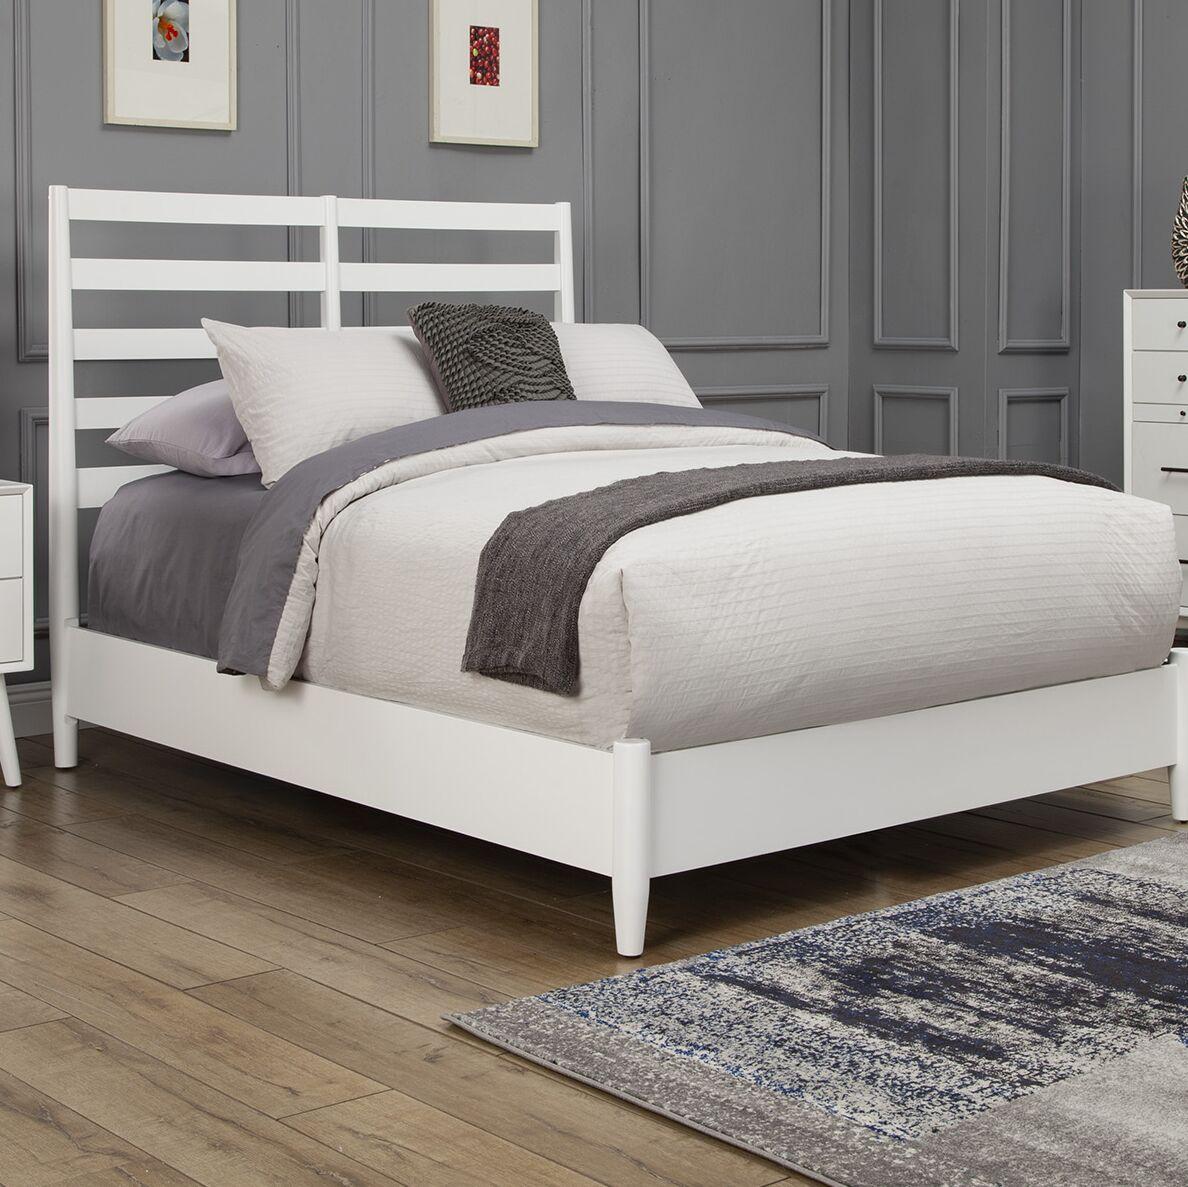 Parocela Retro Panel Bed Size: King, Color: White